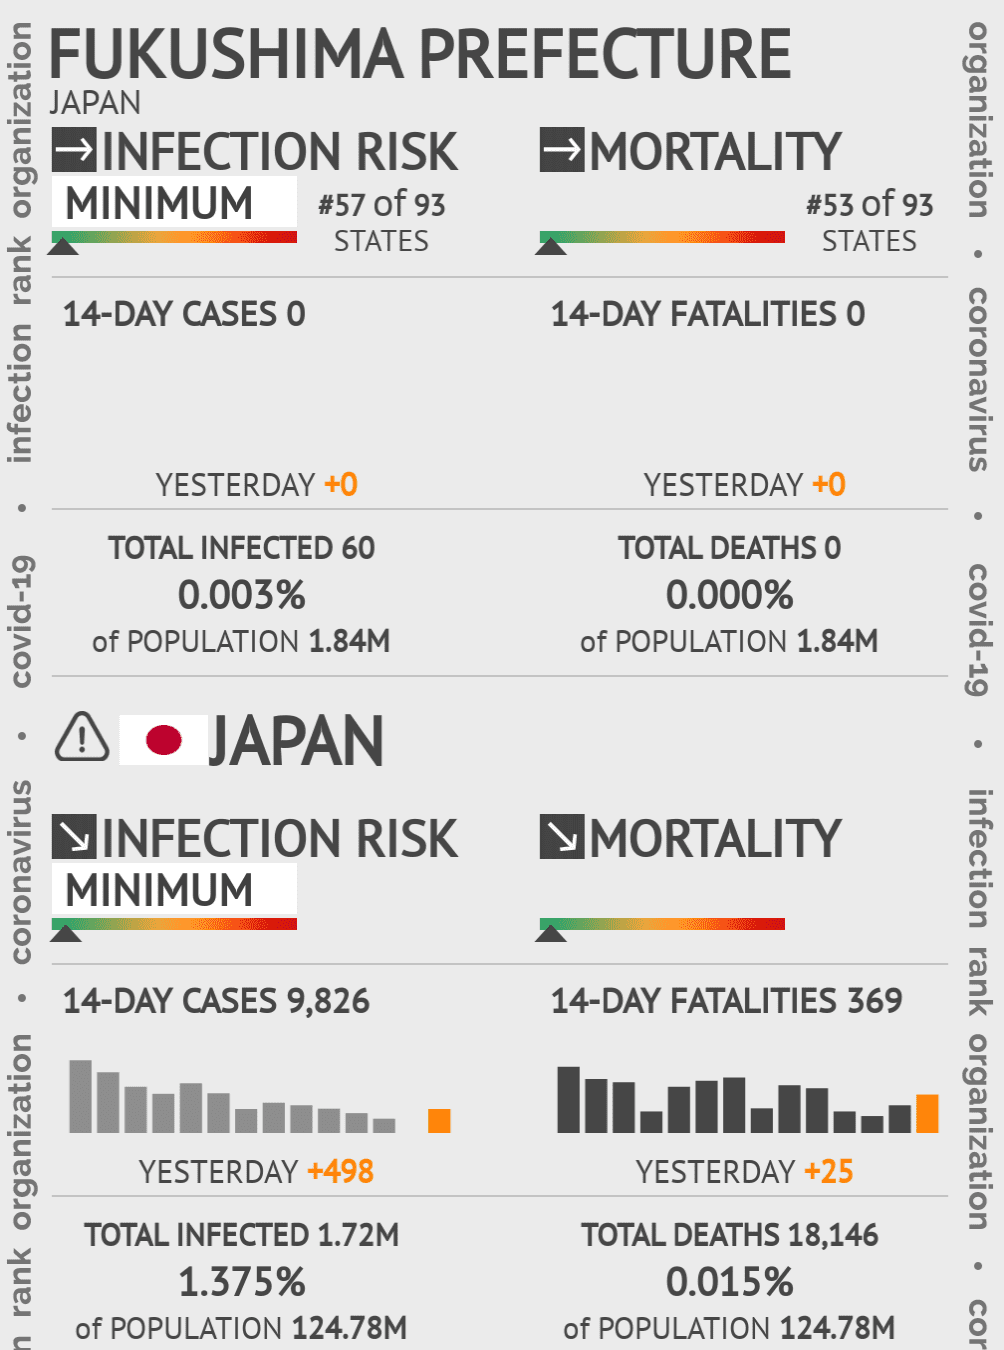 Fukushima Prefecture Coronavirus Covid-19 Risk of Infection on May 14, 2020